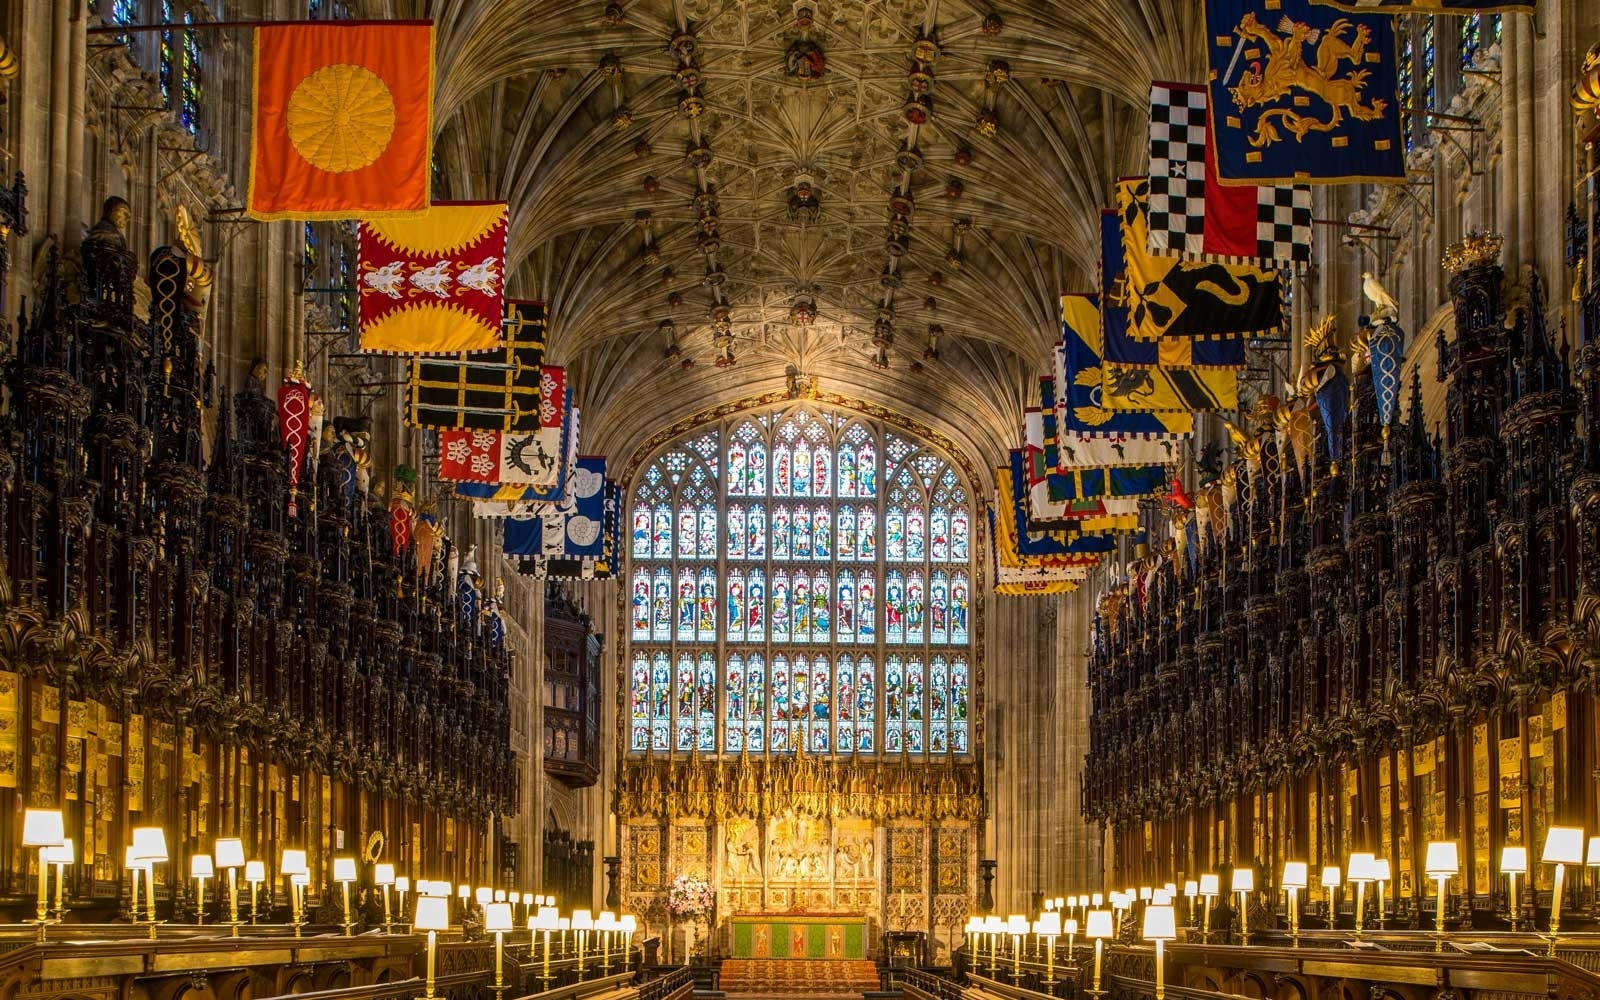 Carillon Concert - Royal Wedding Celebration